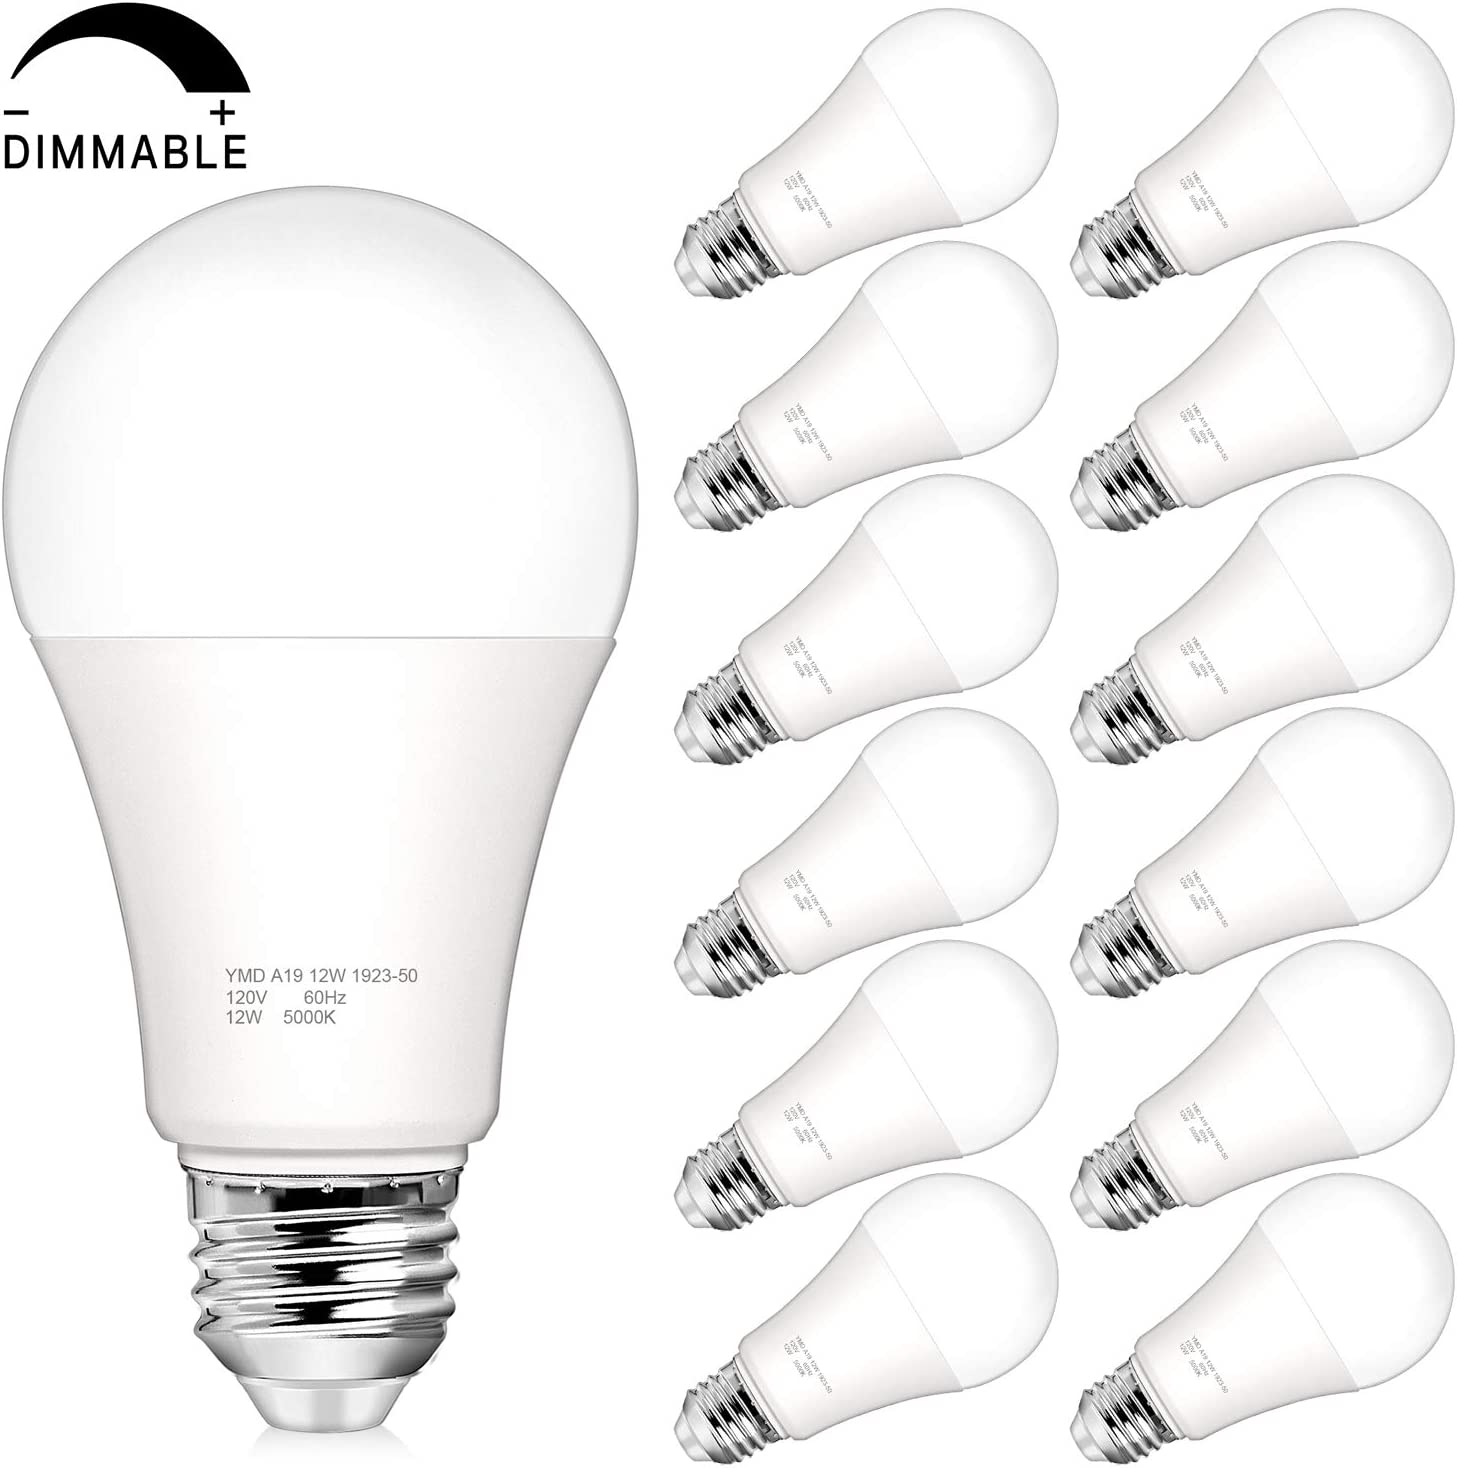 Pack of 12 No Flicker E26 Medium Screw Base CRI 85+ 5000K Daylight White 12W 100 Watt Equivalent LED Bulbs Dimmable A19 LED Light Bulbs 25000+ Hours Lifespan 1200 Lumens